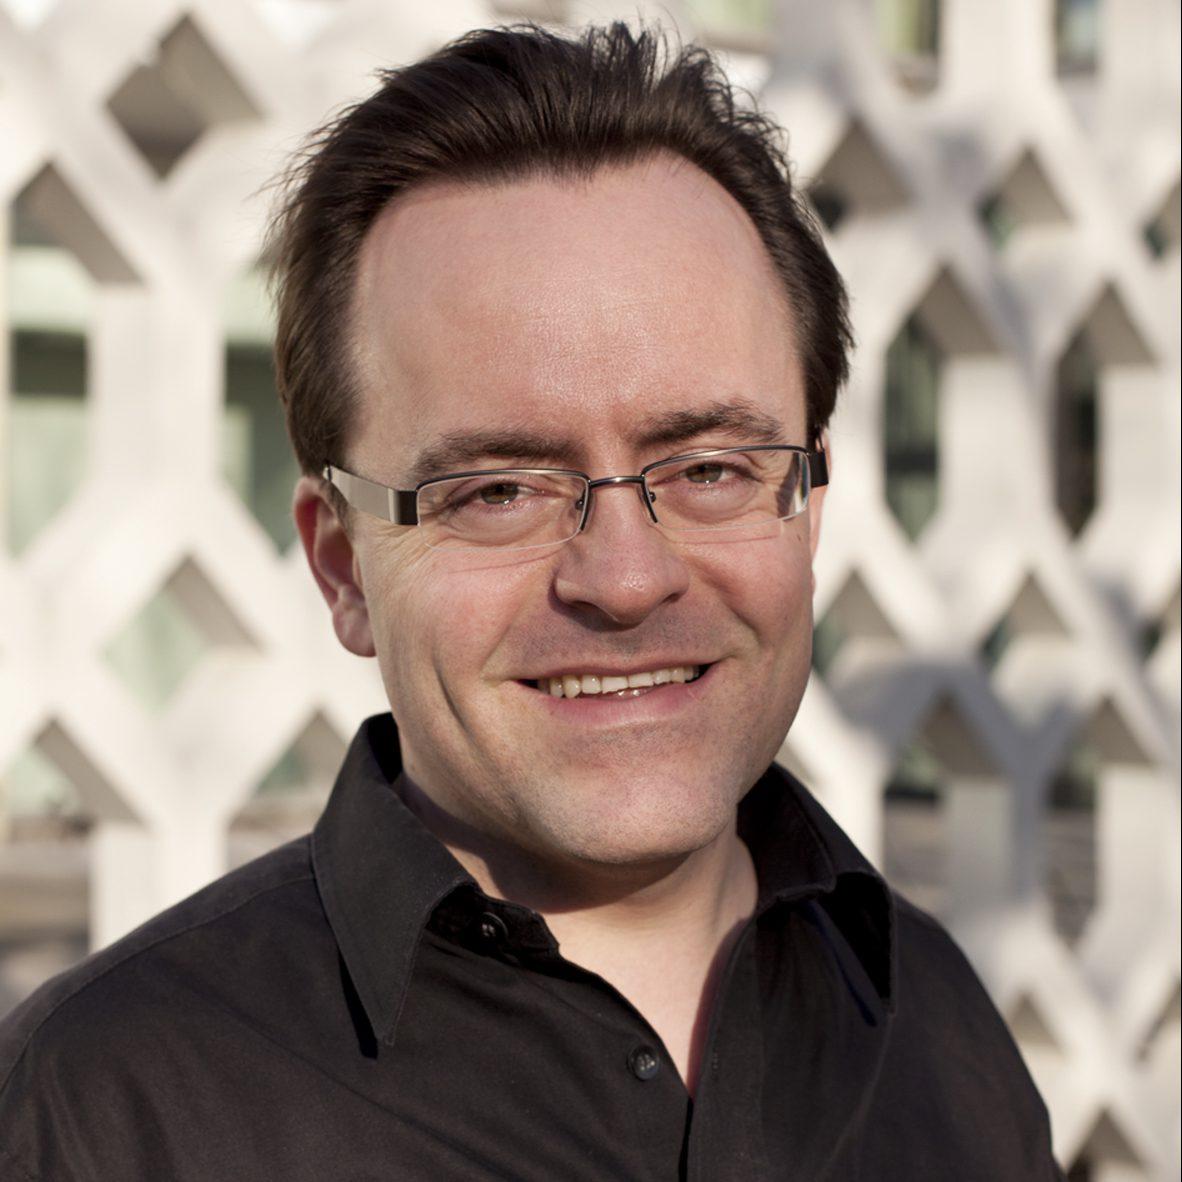 Matthias Hartwig